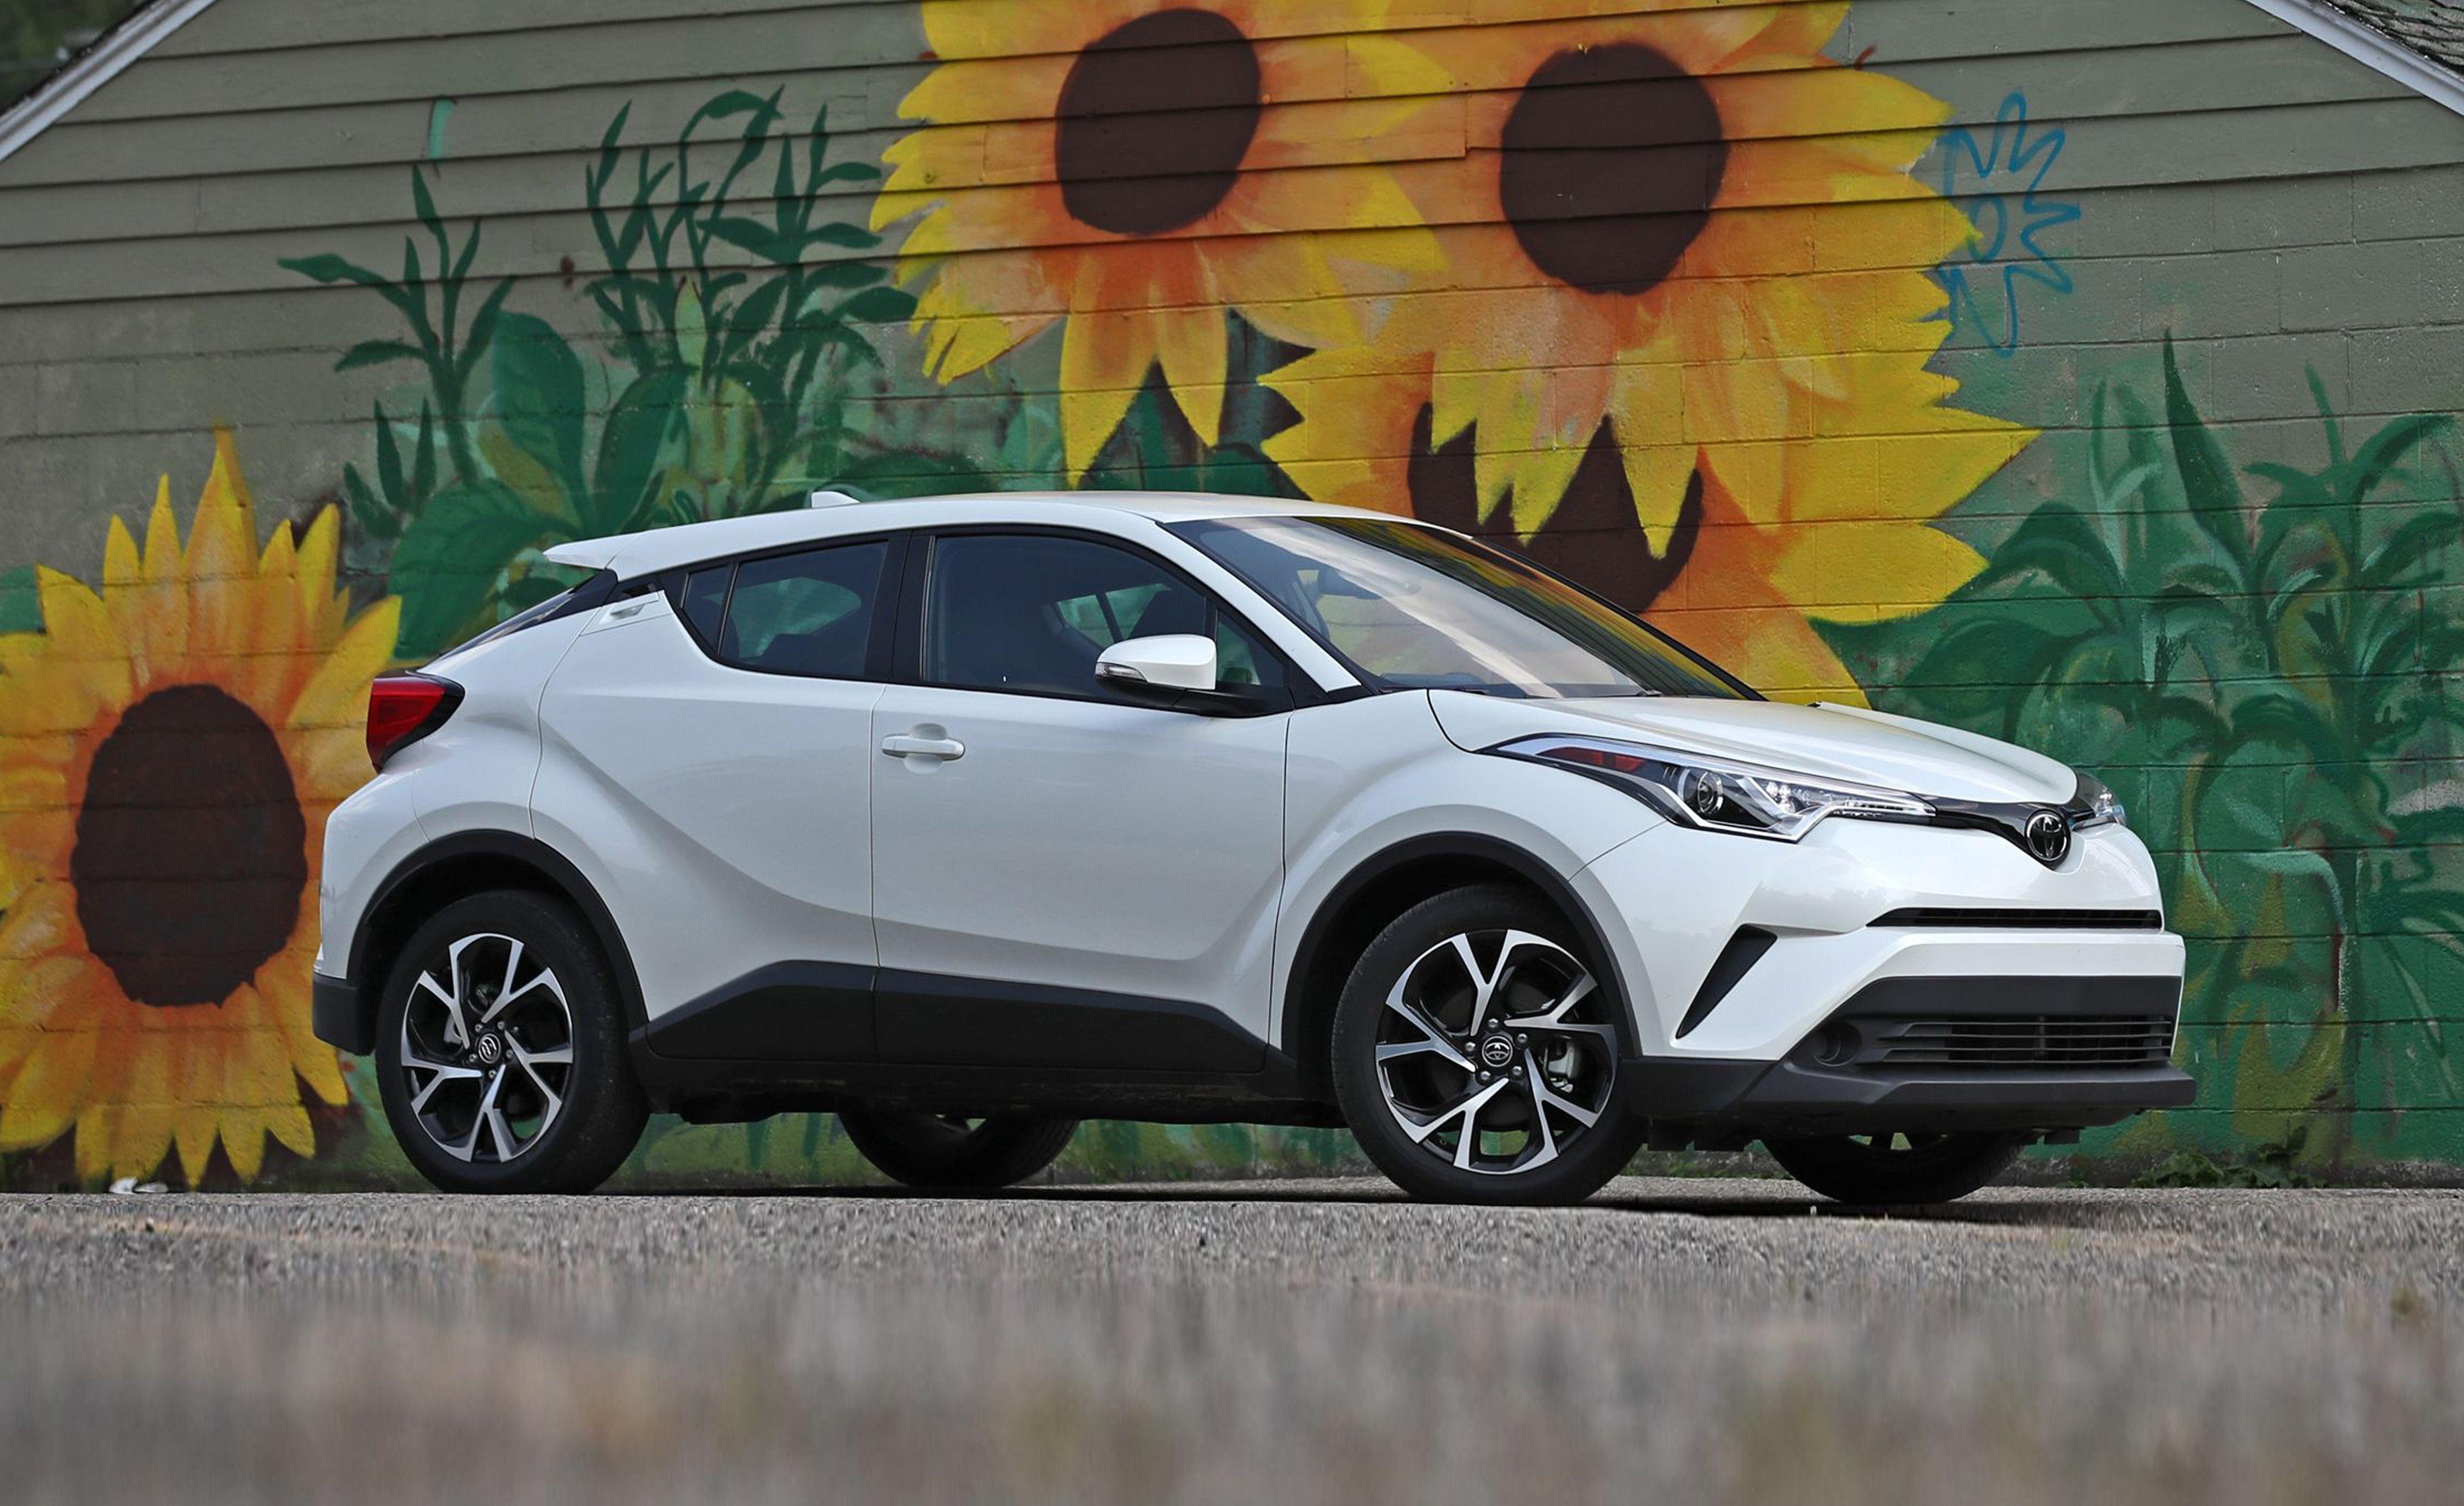 Kekurangan Toyota 2019 Tangguh